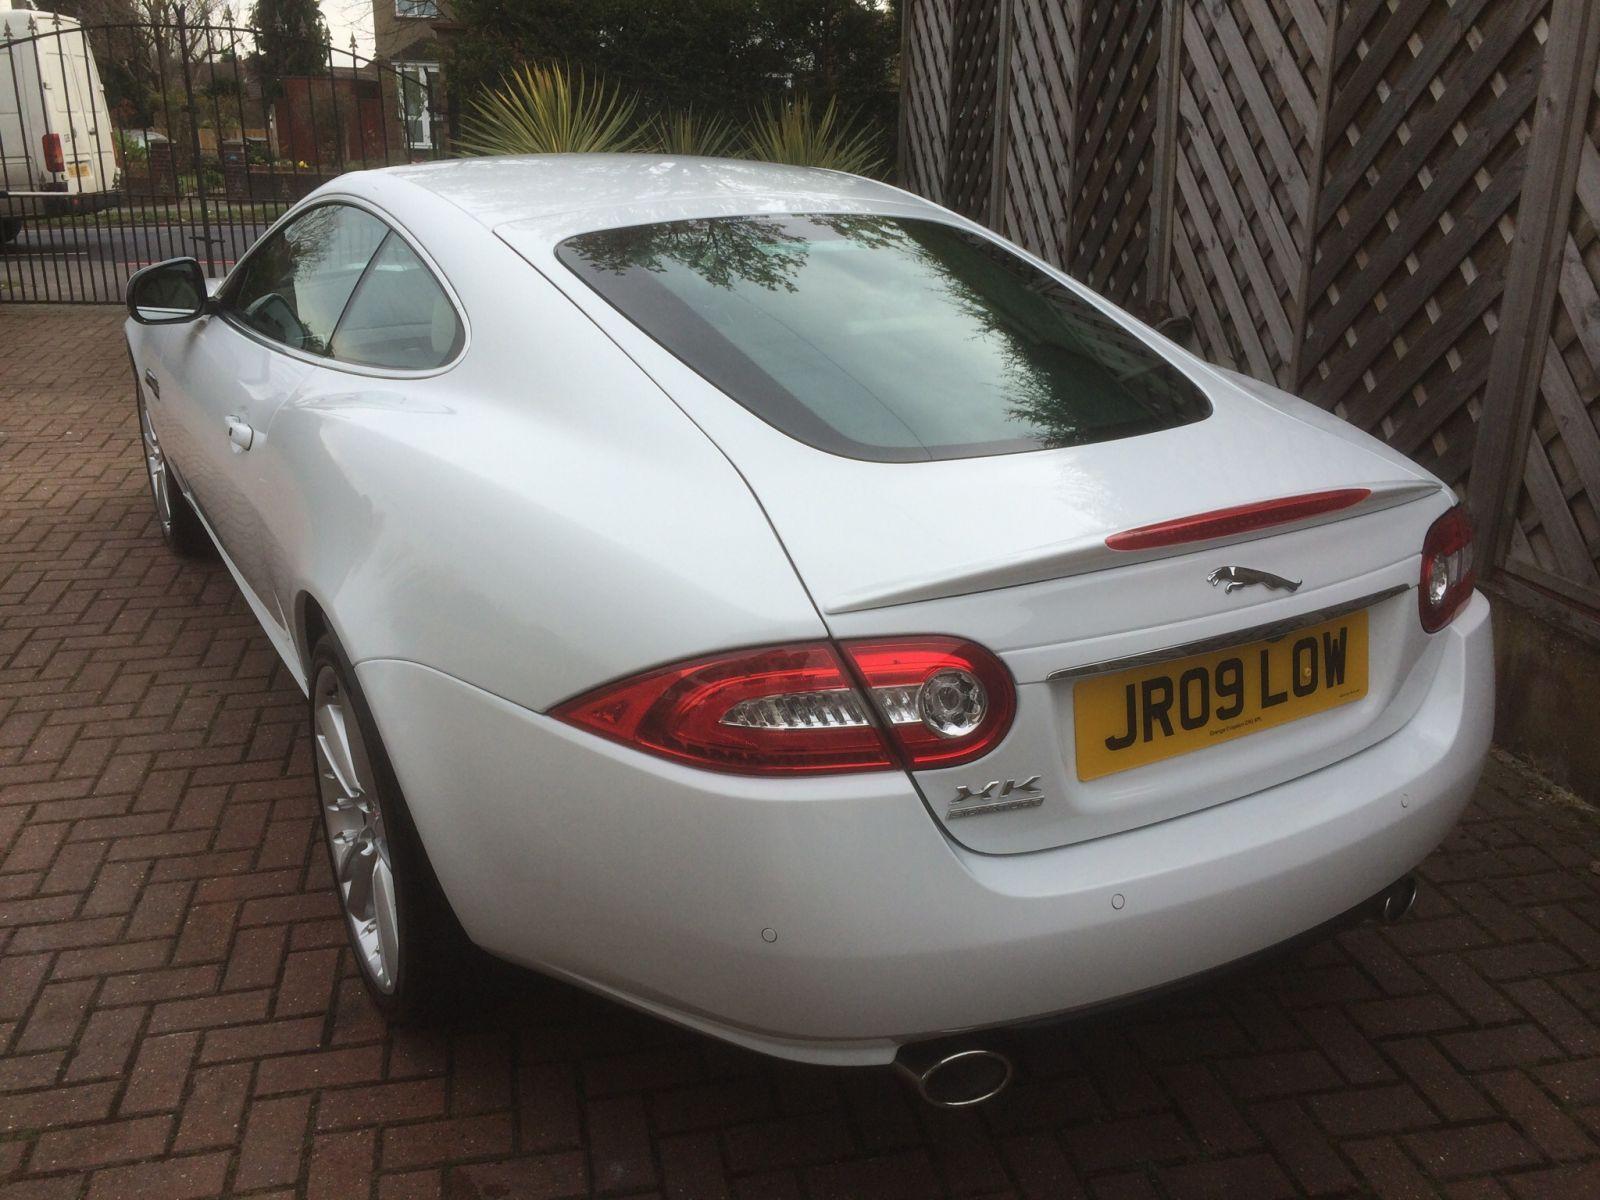 Jaguar Owners Club on rear screen